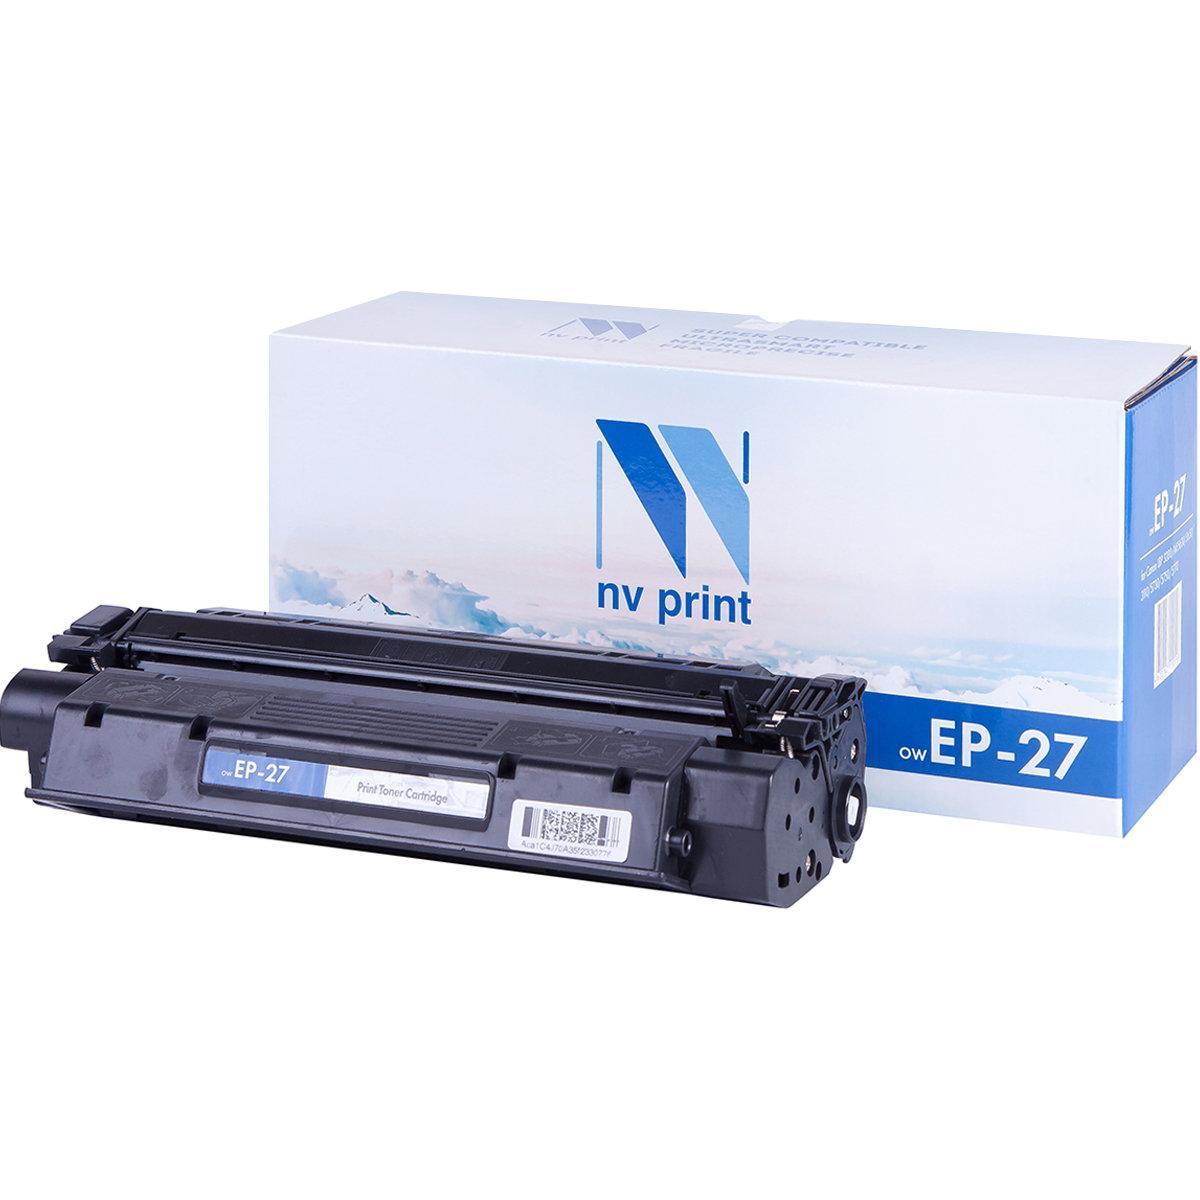 Картридж NVP совместимый Canon NV-EP27 для i-SENSYS MF3228/LaserBase MF3110/MF3240/MF5630/MF5650/MF573